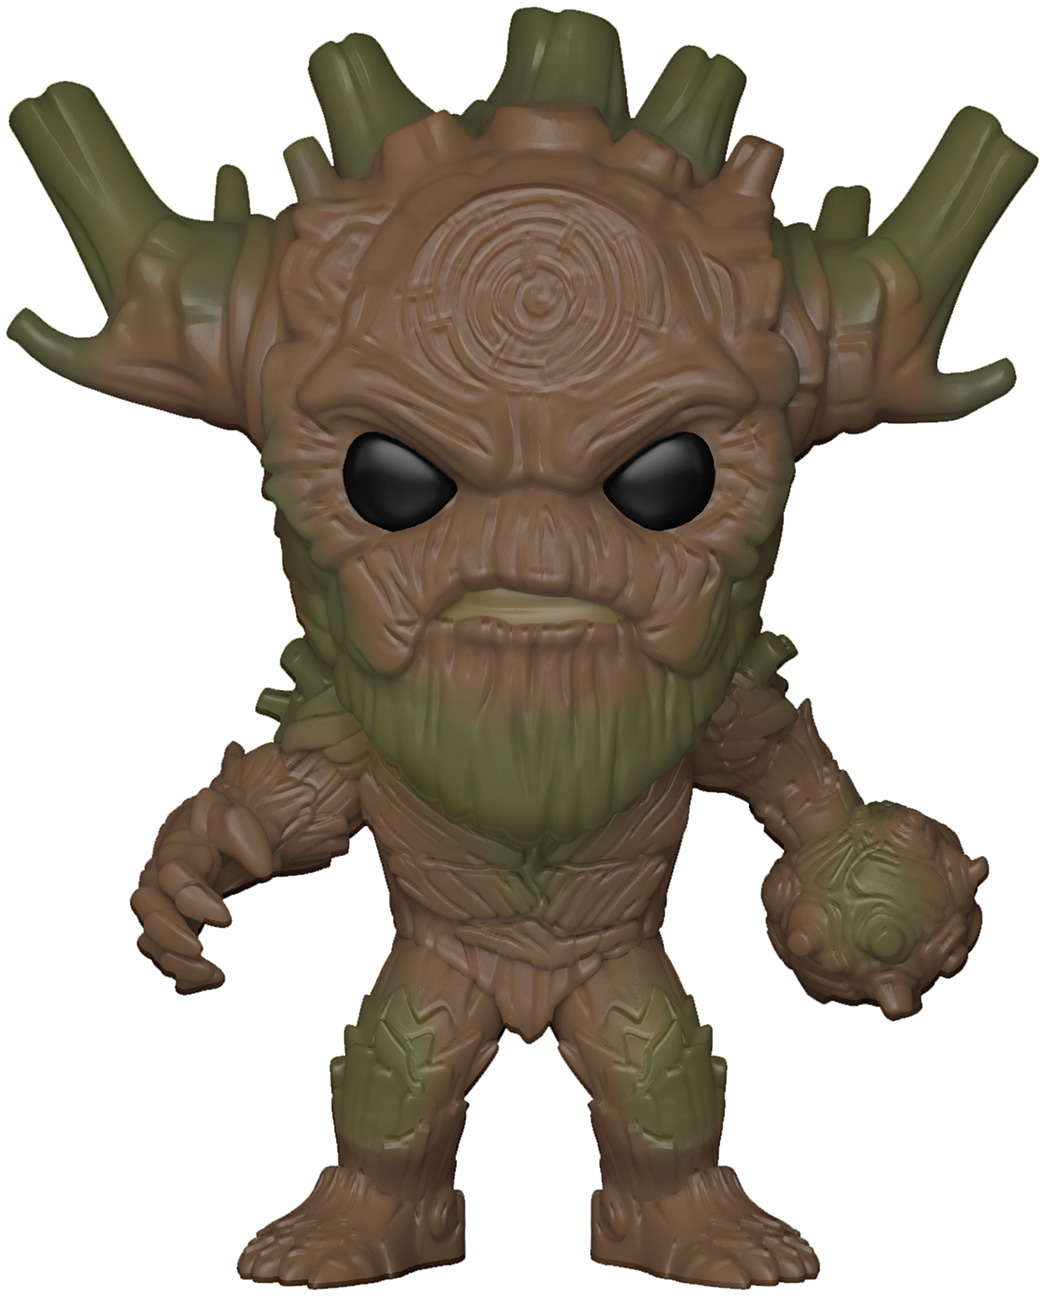 Marvel: Contest of Champions - King Groot Pop! Vinyl Figure image